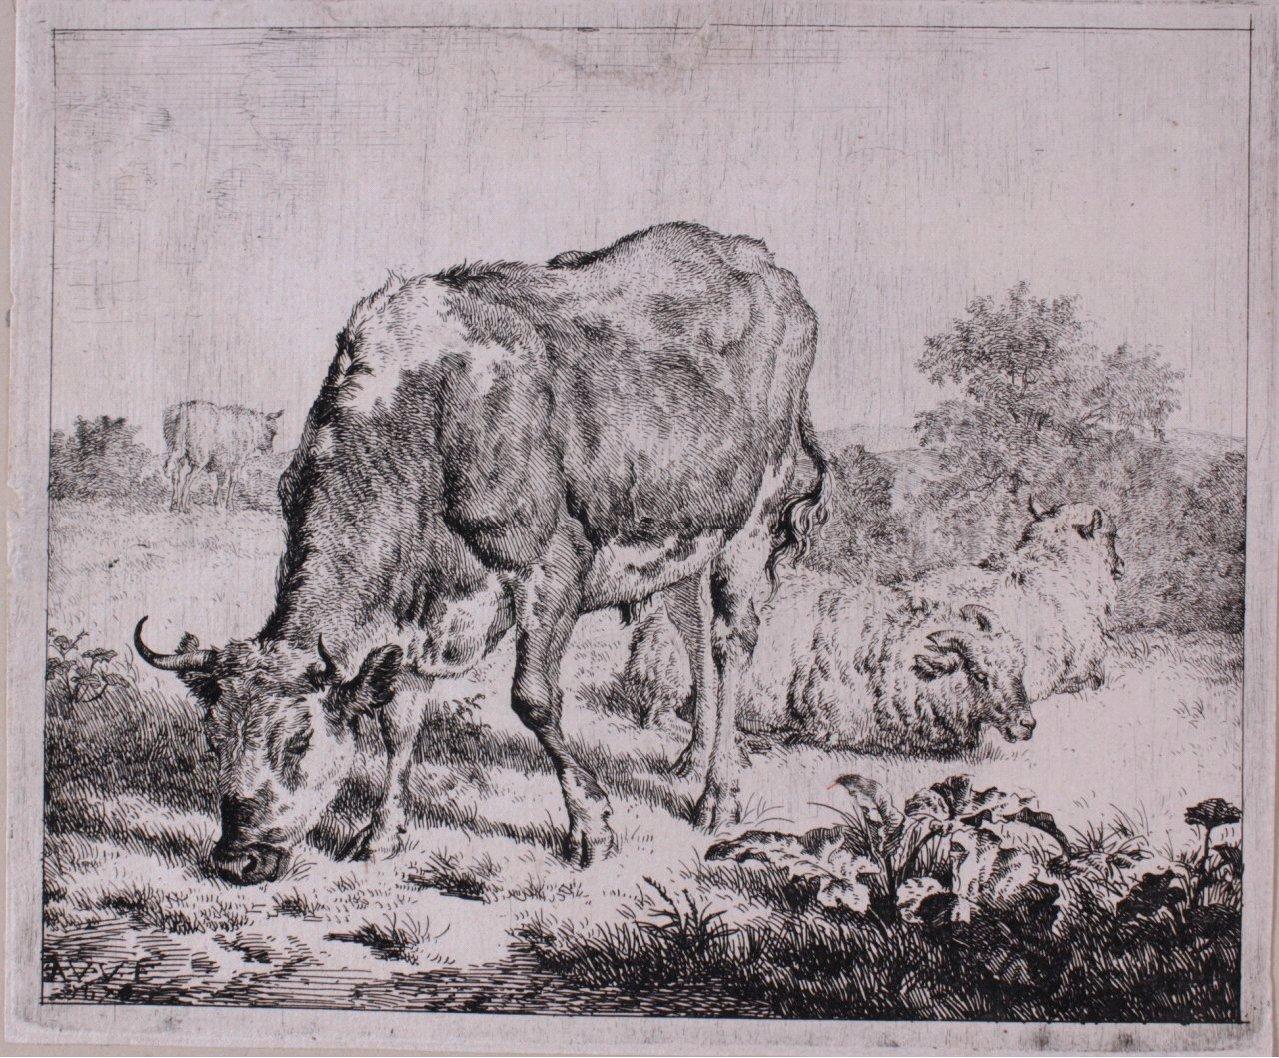 Adriaen van der Velde (1636 – 1672)